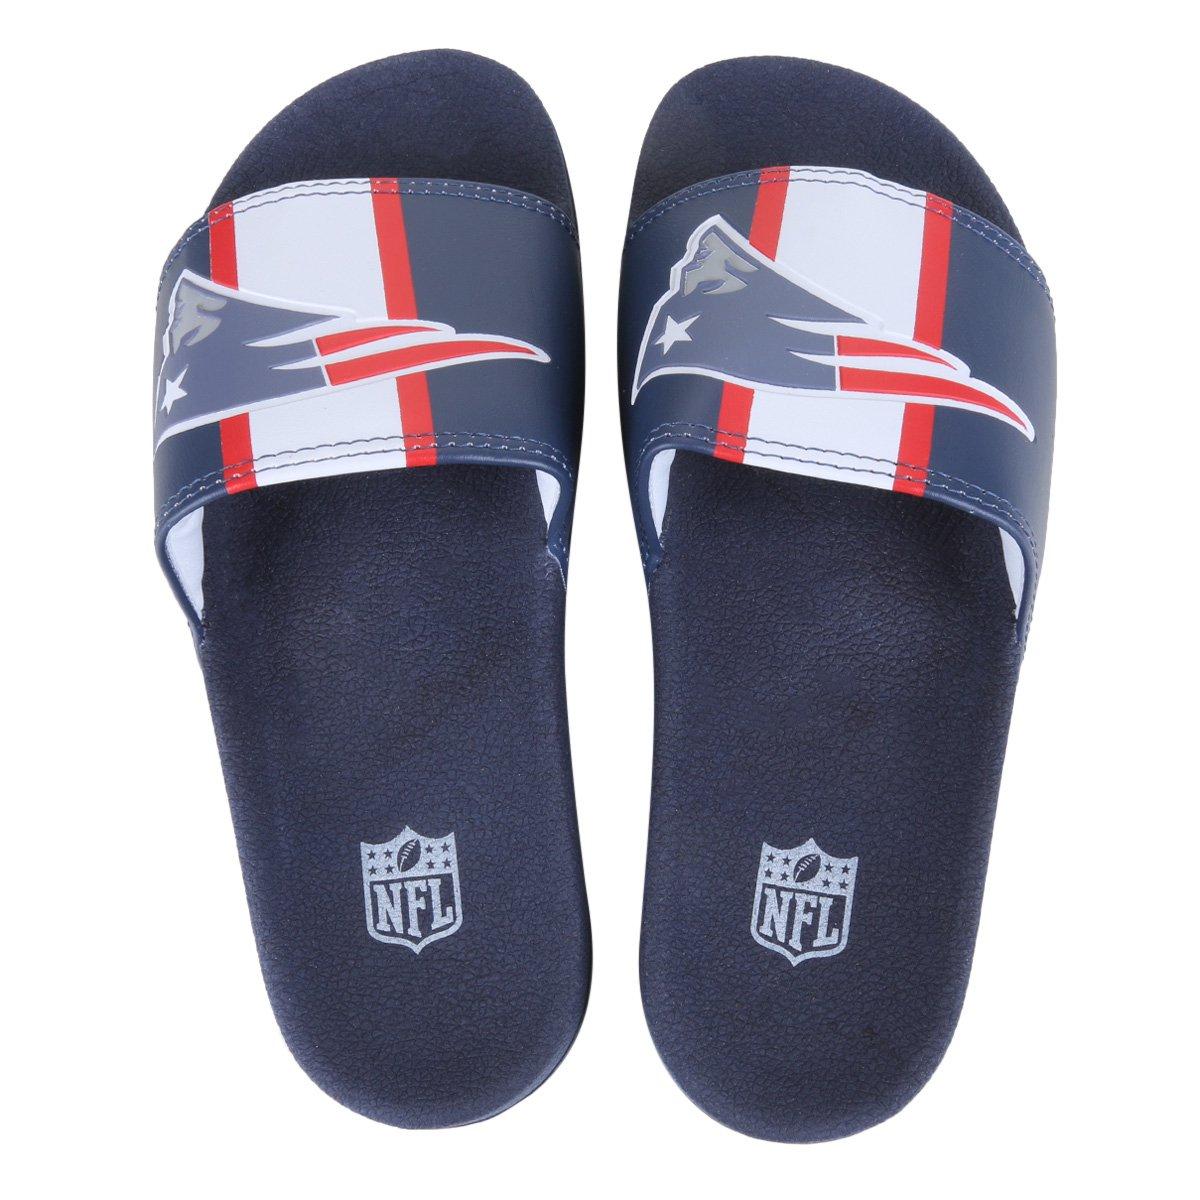 Chinelo Slide NFL New England Patriots Masculino